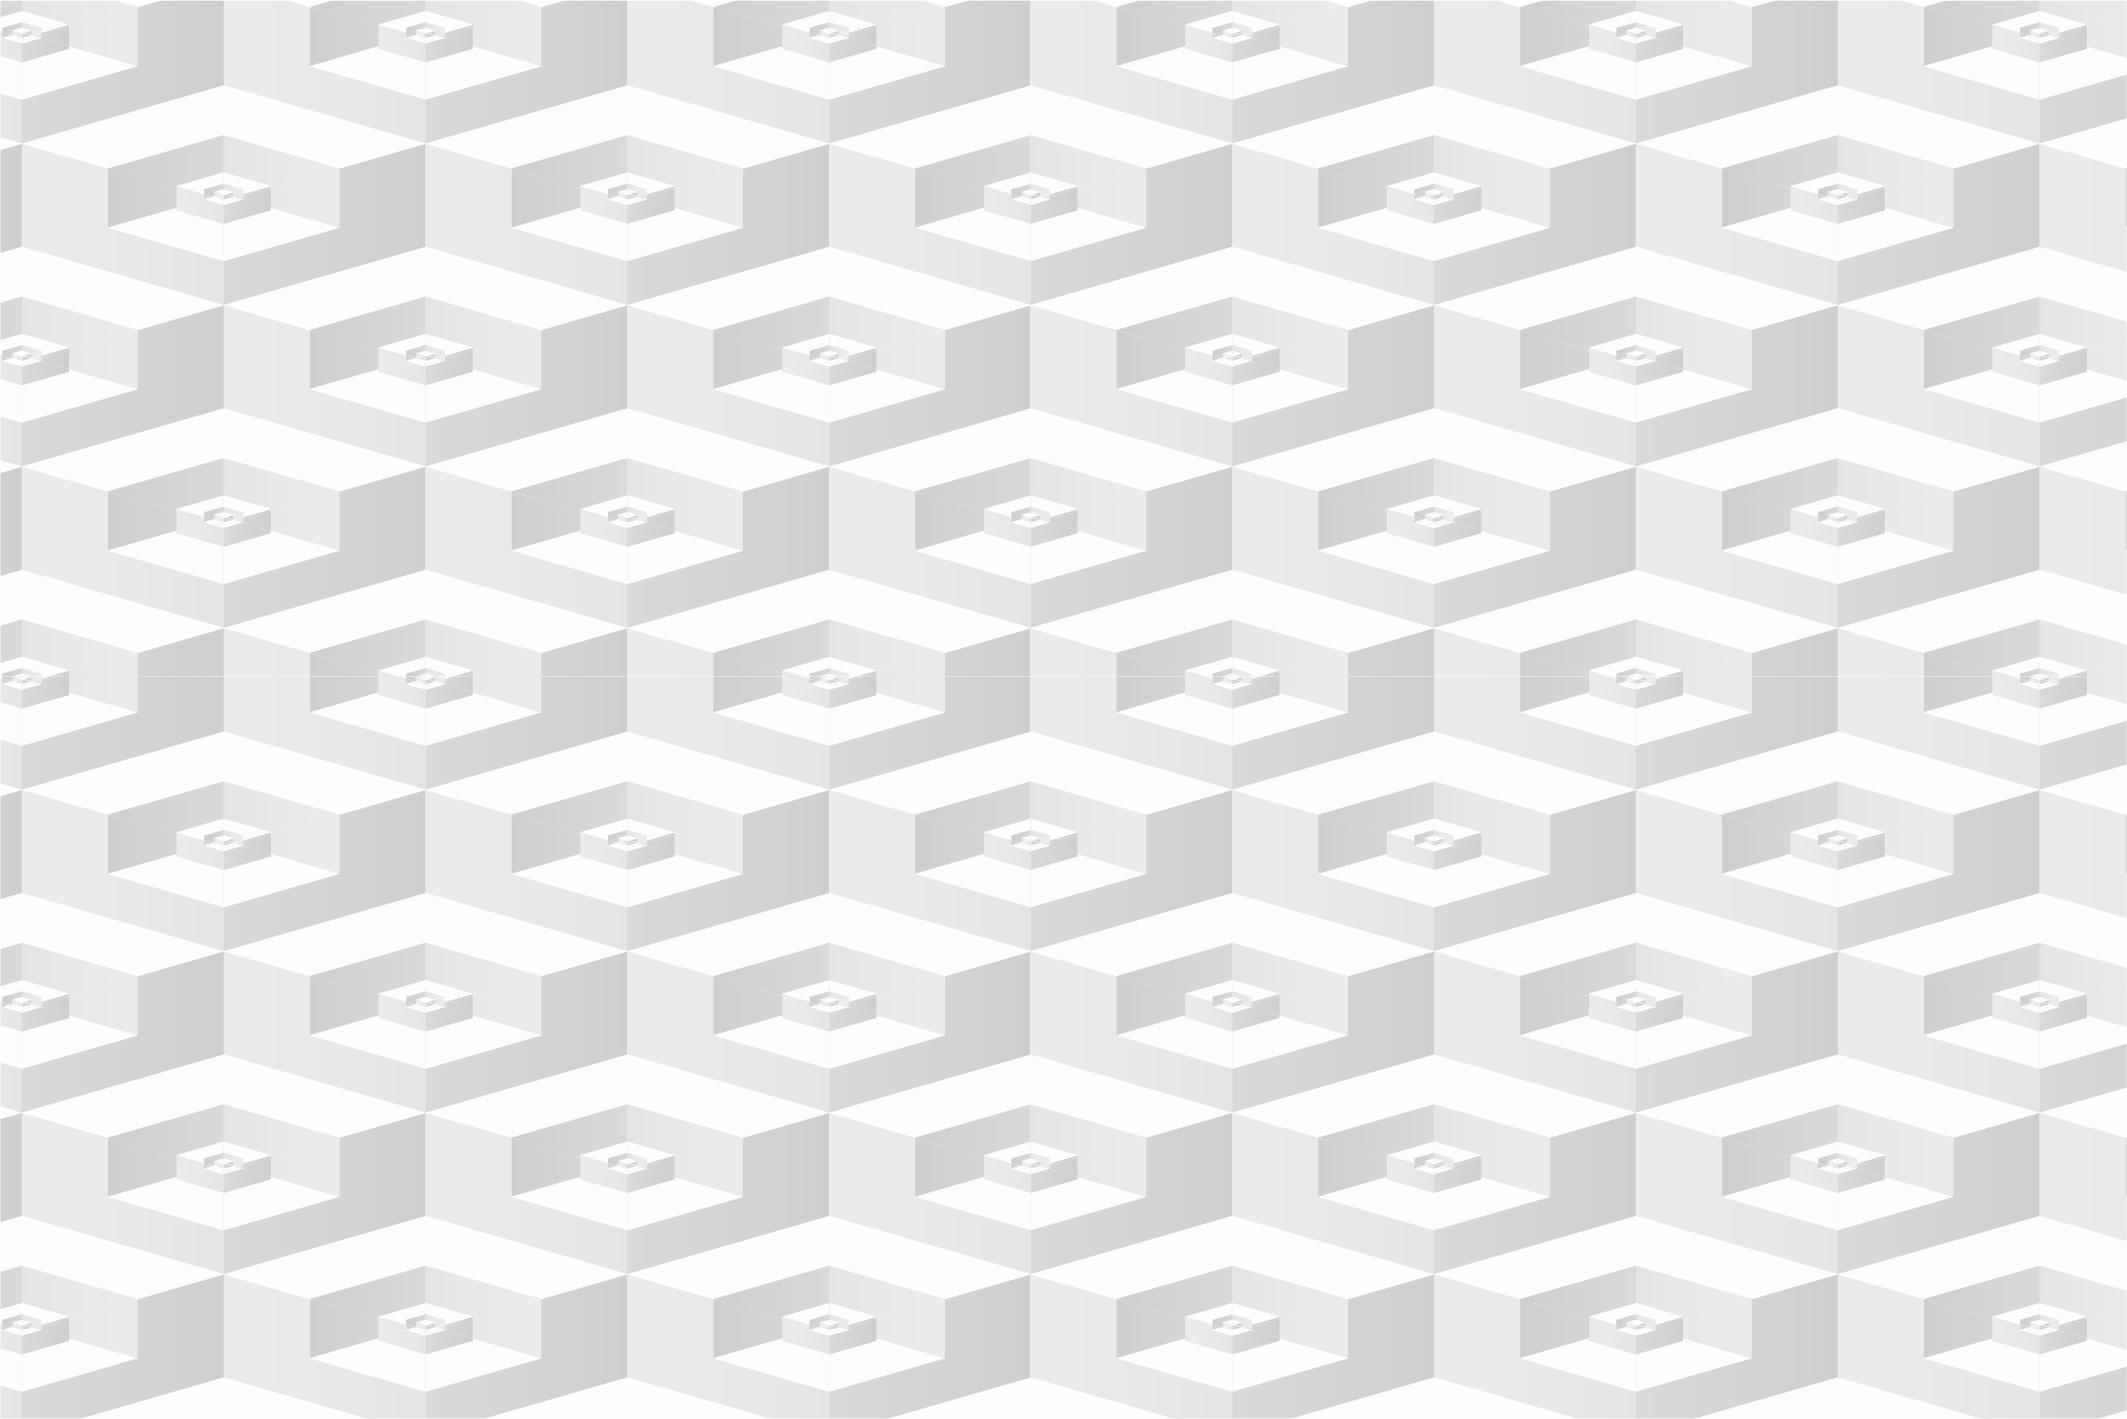 White geometric 3d seamless textures example image 9